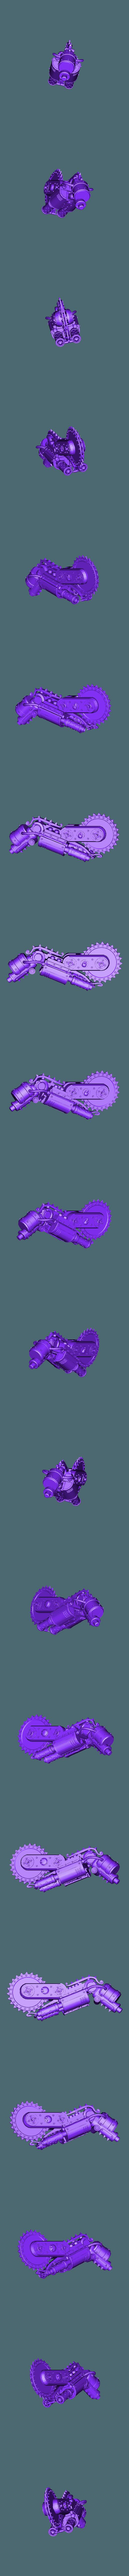 Penny 2.0 Arm B.stl Download STL file Penny Nun Bot 2.0 • 3D print model, Leesedrenfort